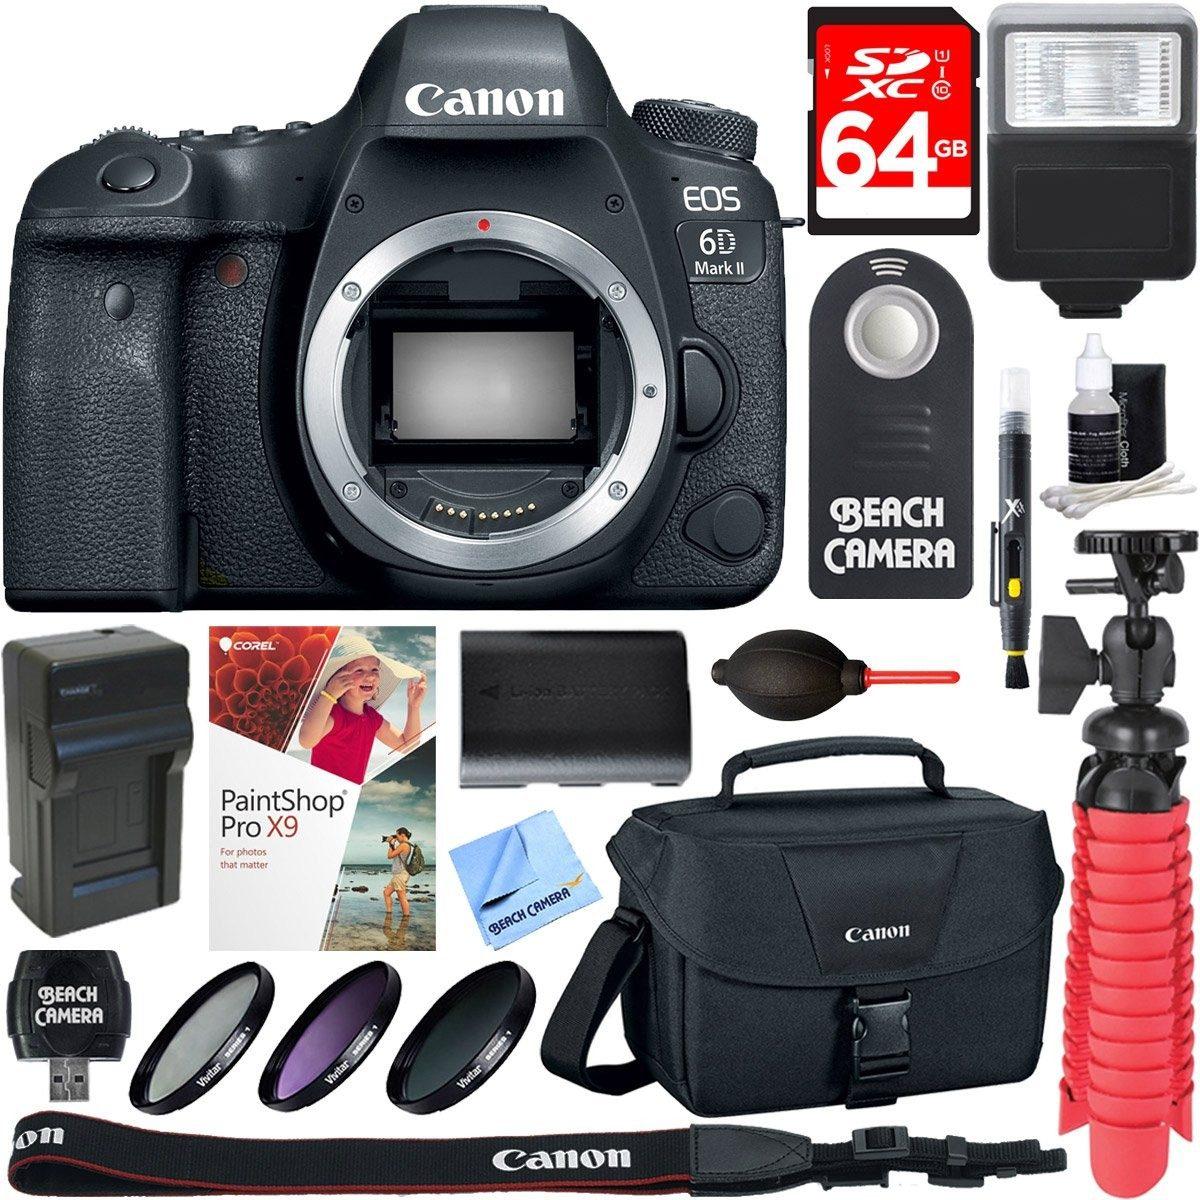 Camara Canon Eos 6d Mark Ii 26.2mp Full-frame Digital Sl 830 ...